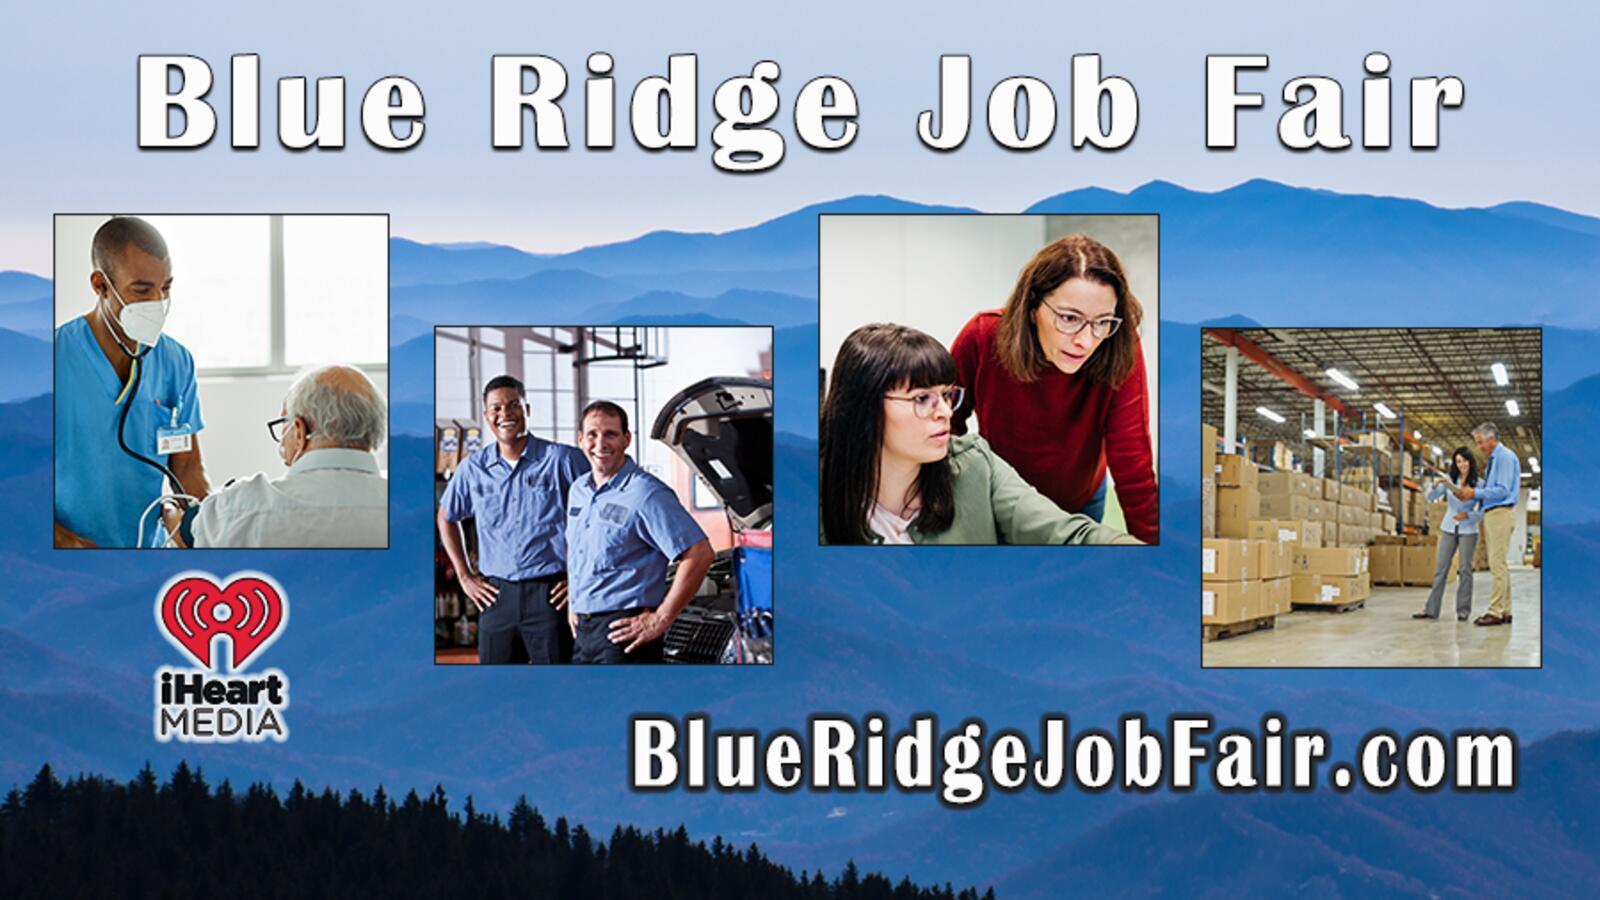 Blue Ridge Job Fair! Browse jobs from top companies in the Roanoke/Lynchburg area!